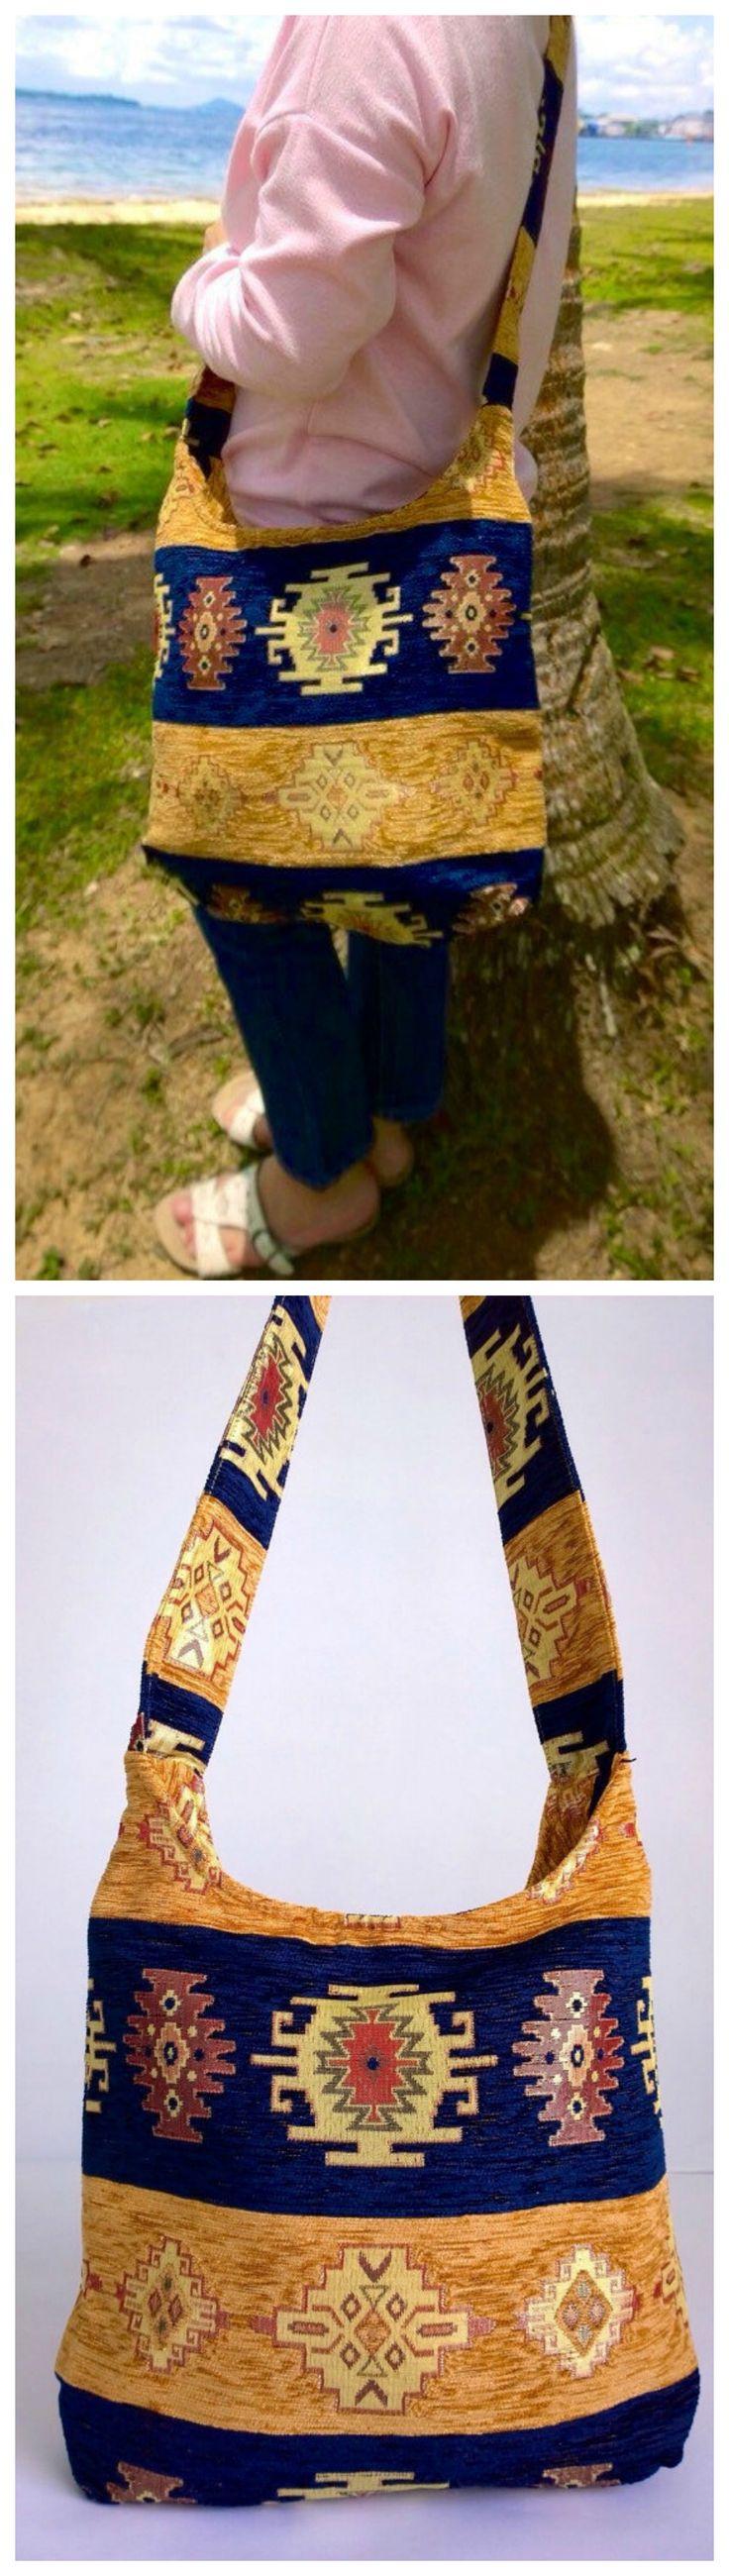 Boho Crossbody Bag - Embroidery Bag - Ethnic Bag ( FREE SHIPPING WORLDWIDE )